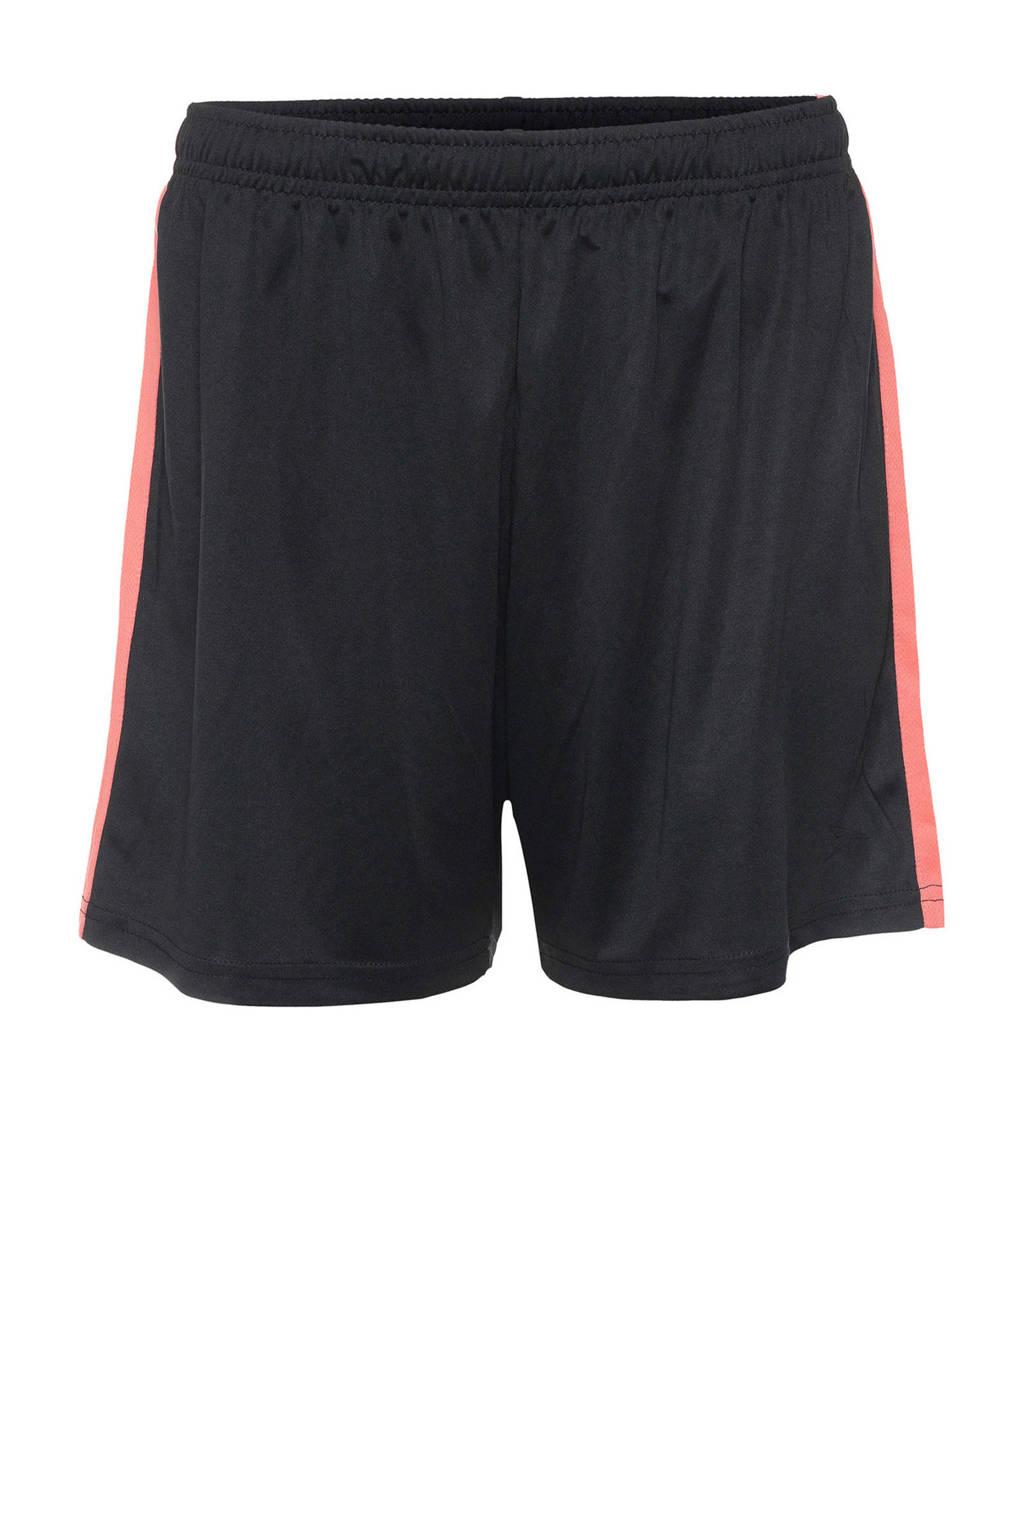 Scapino Dutchy voetbalshort zwart/roze, Zwart/roze